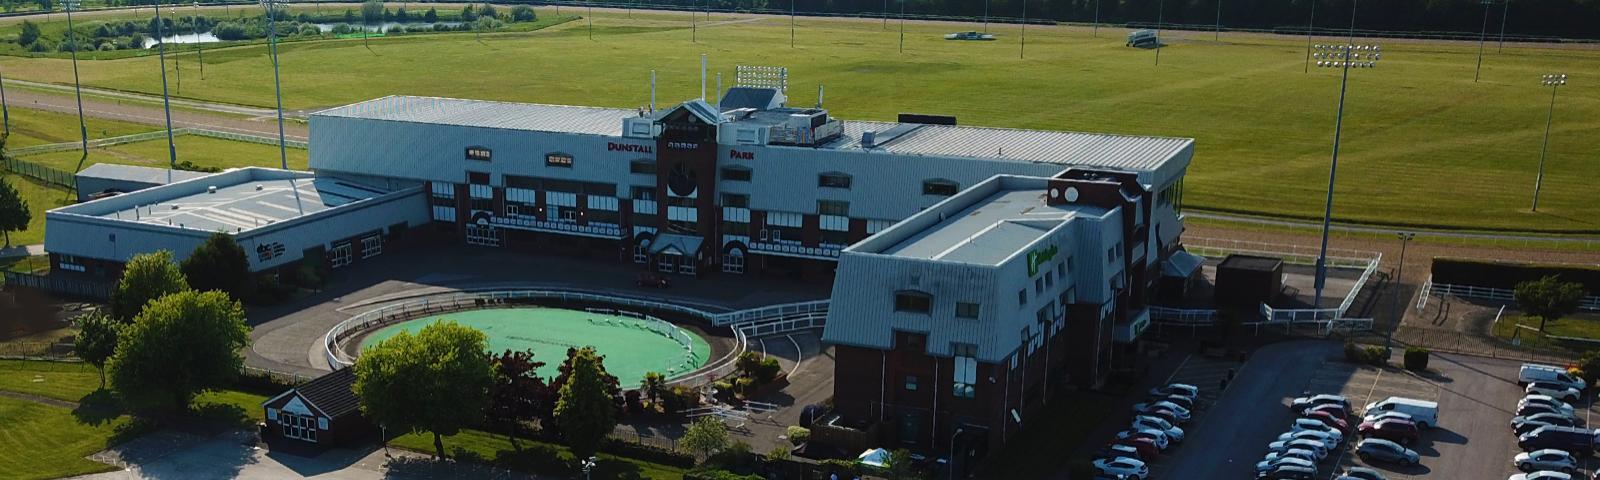 Wolverhampton Racecourse Dunstall Park